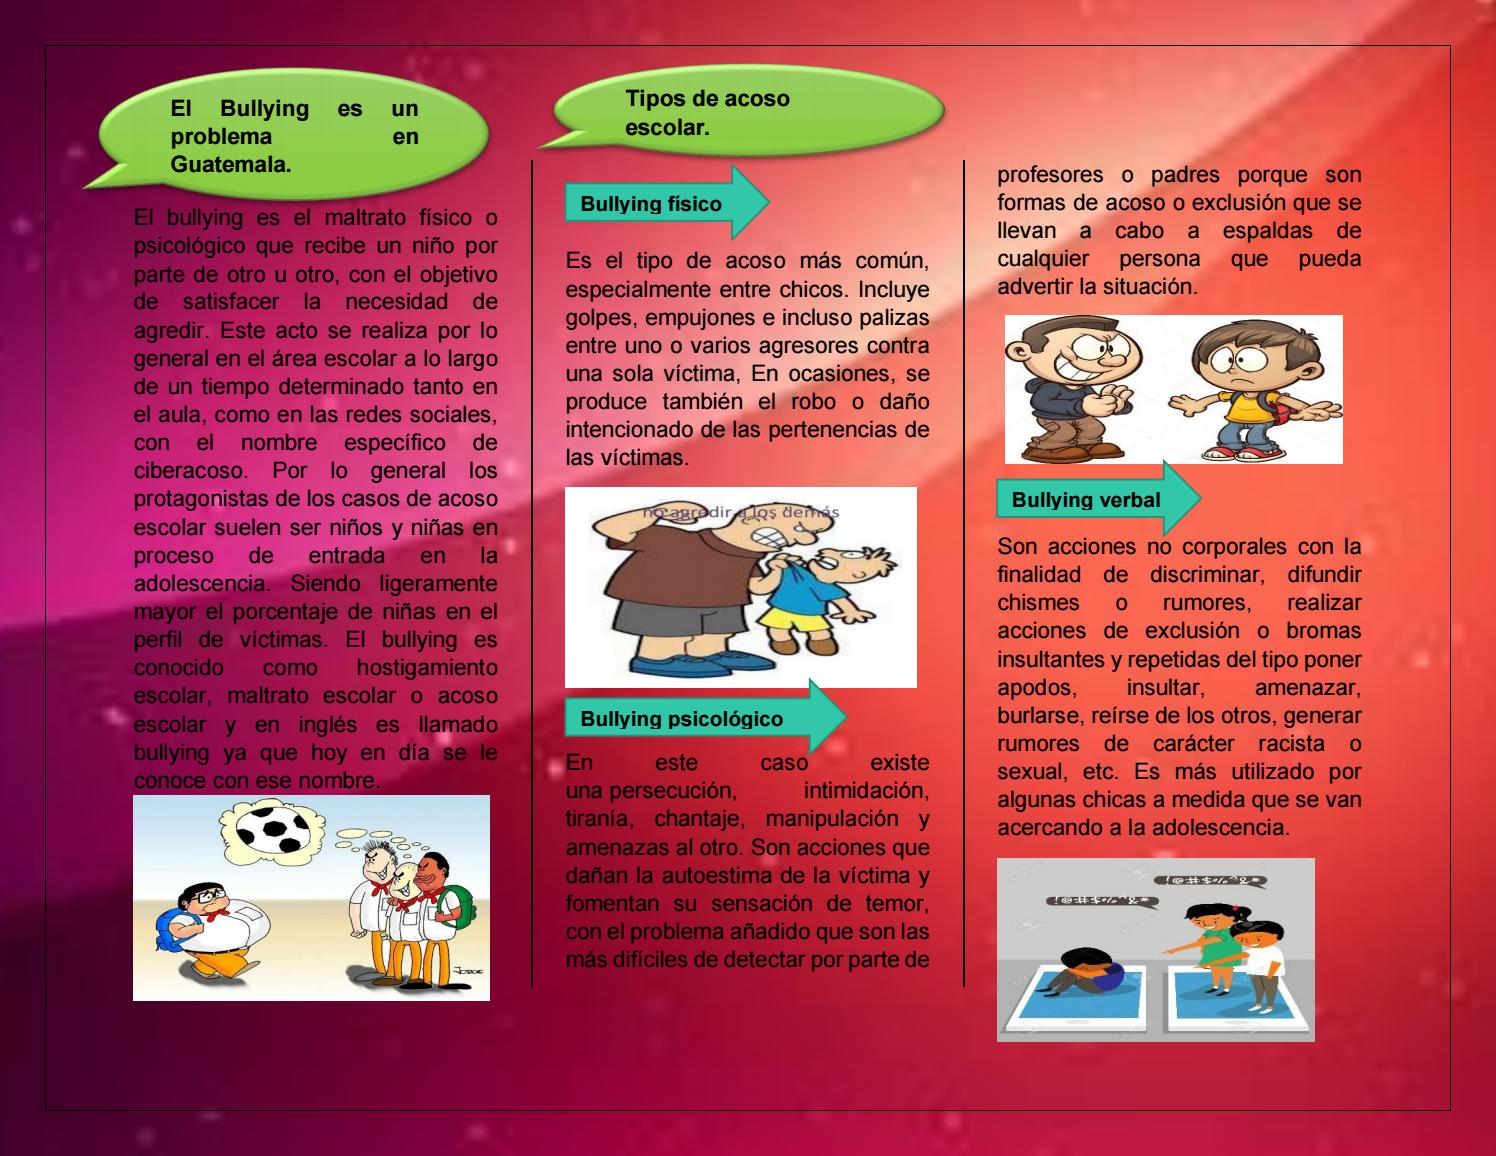 El Bullying es un Problema en Guatemala by renojsumy - issuu